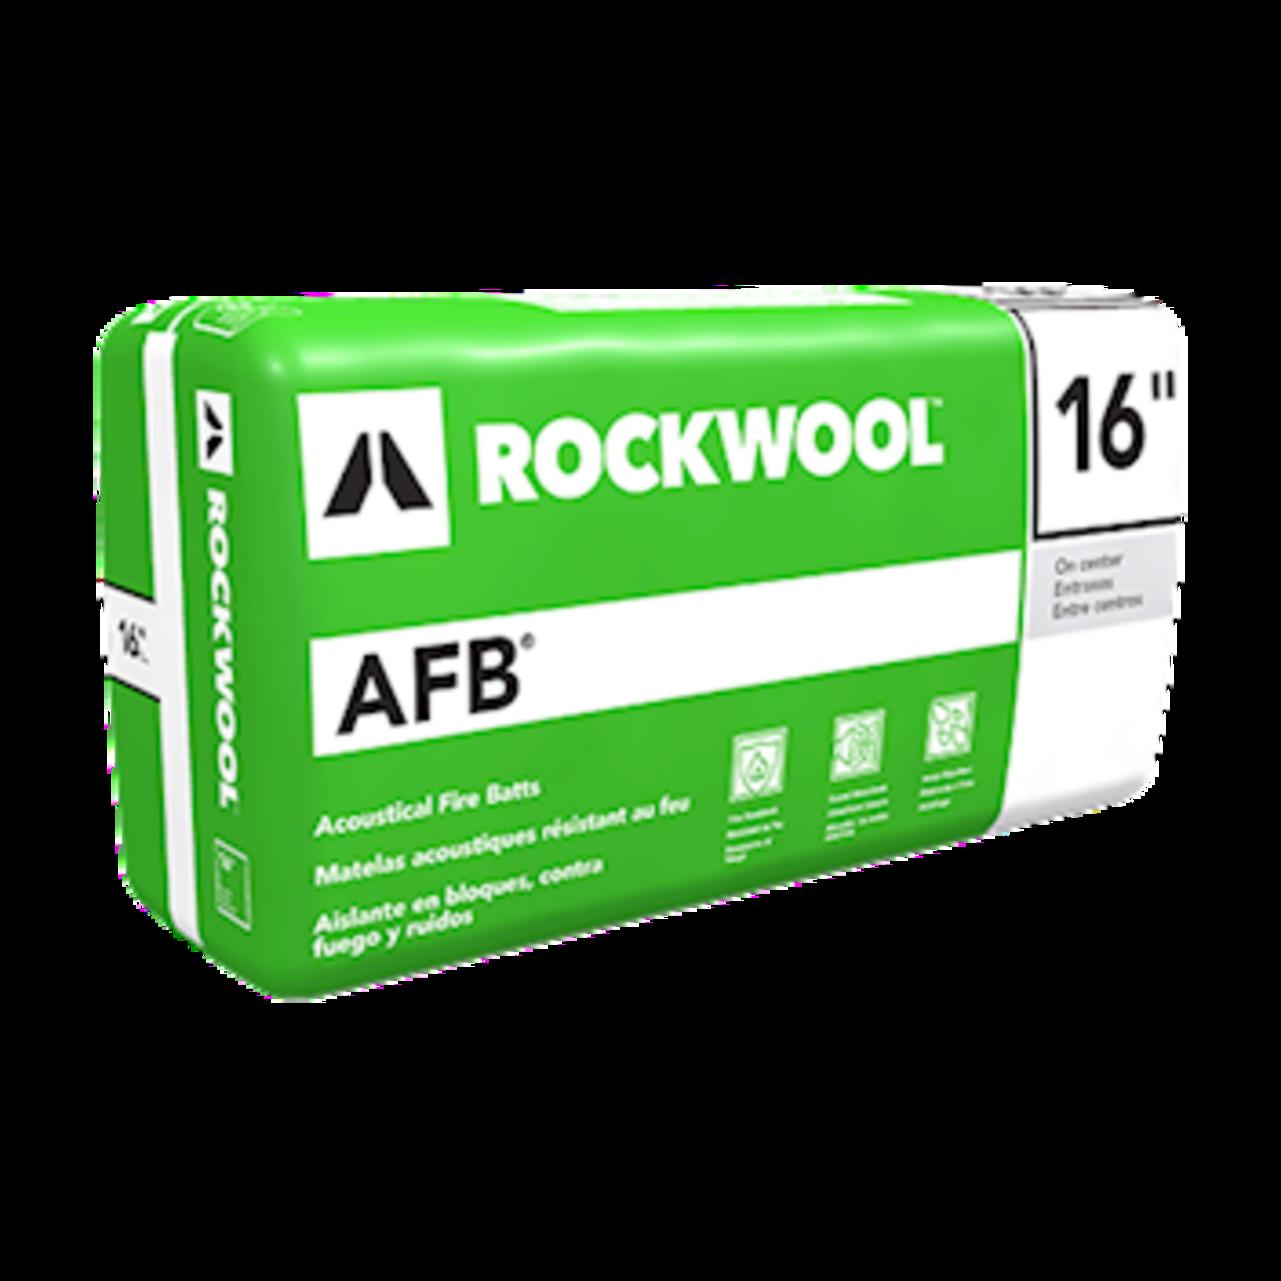 AFB® lightweight, semi-rigid batt insulation for steel stud interior wall and floor applications